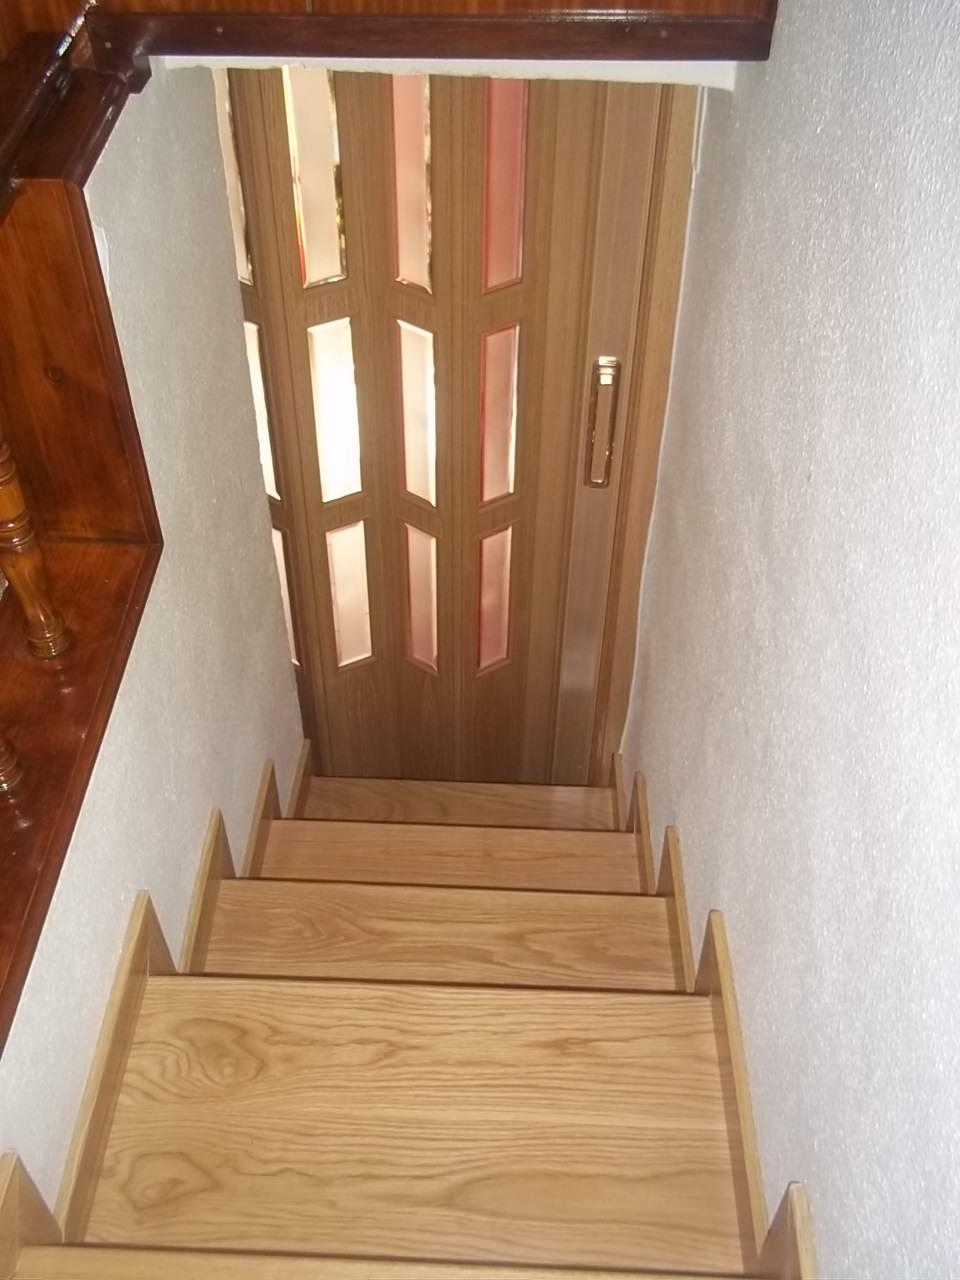 Carpinteria viosca roda puerta plegable con caseton - Puerta plegable madera ...